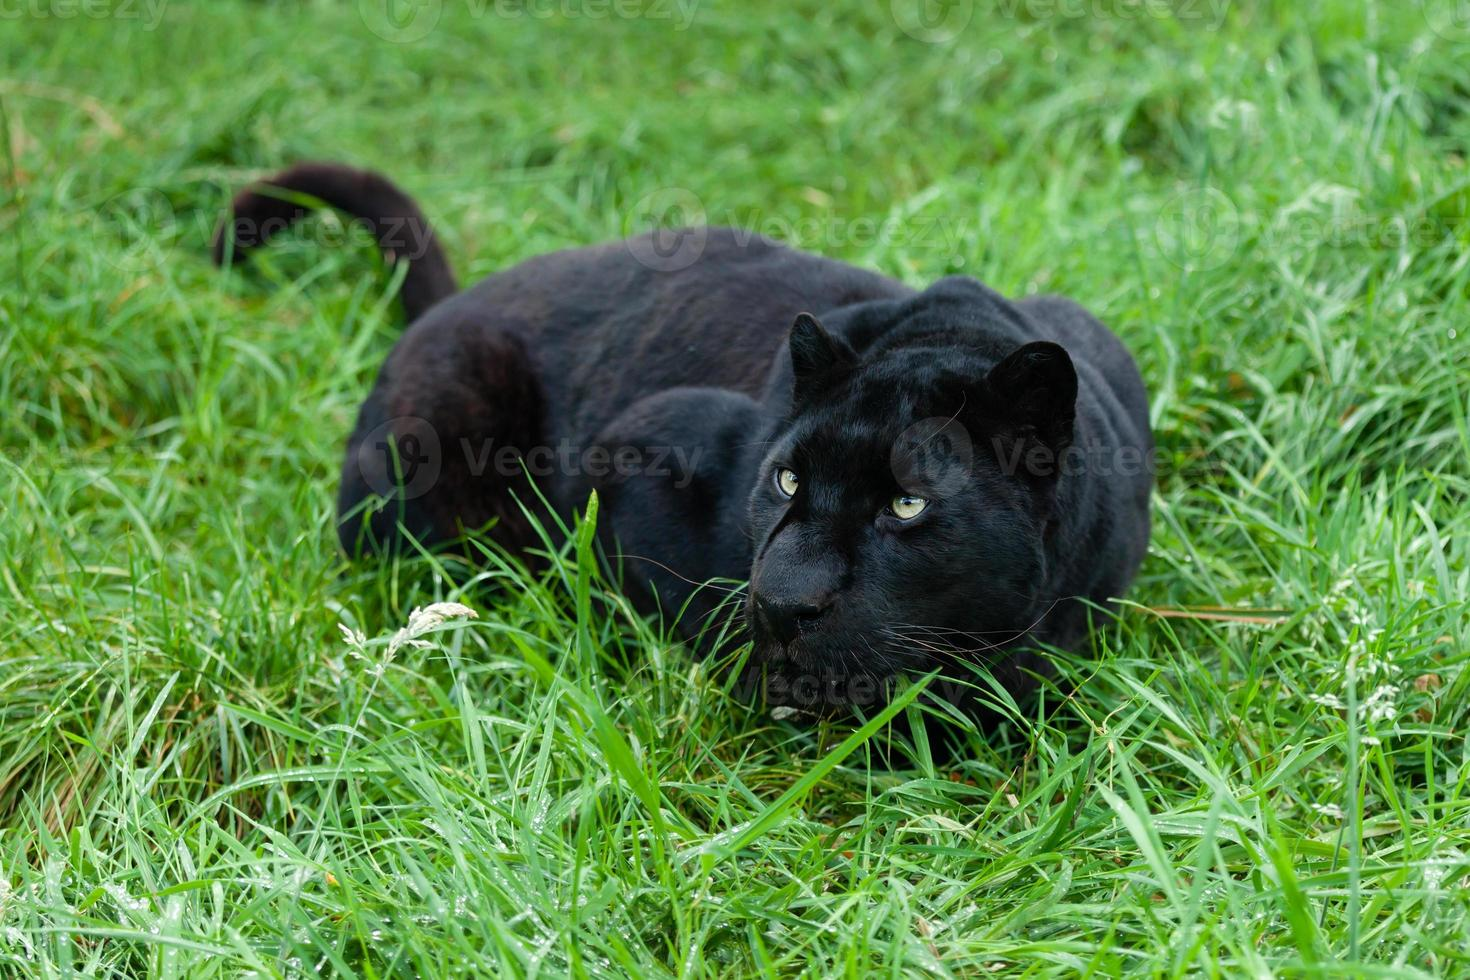 zwarte luipaard stalking in lang gras foto